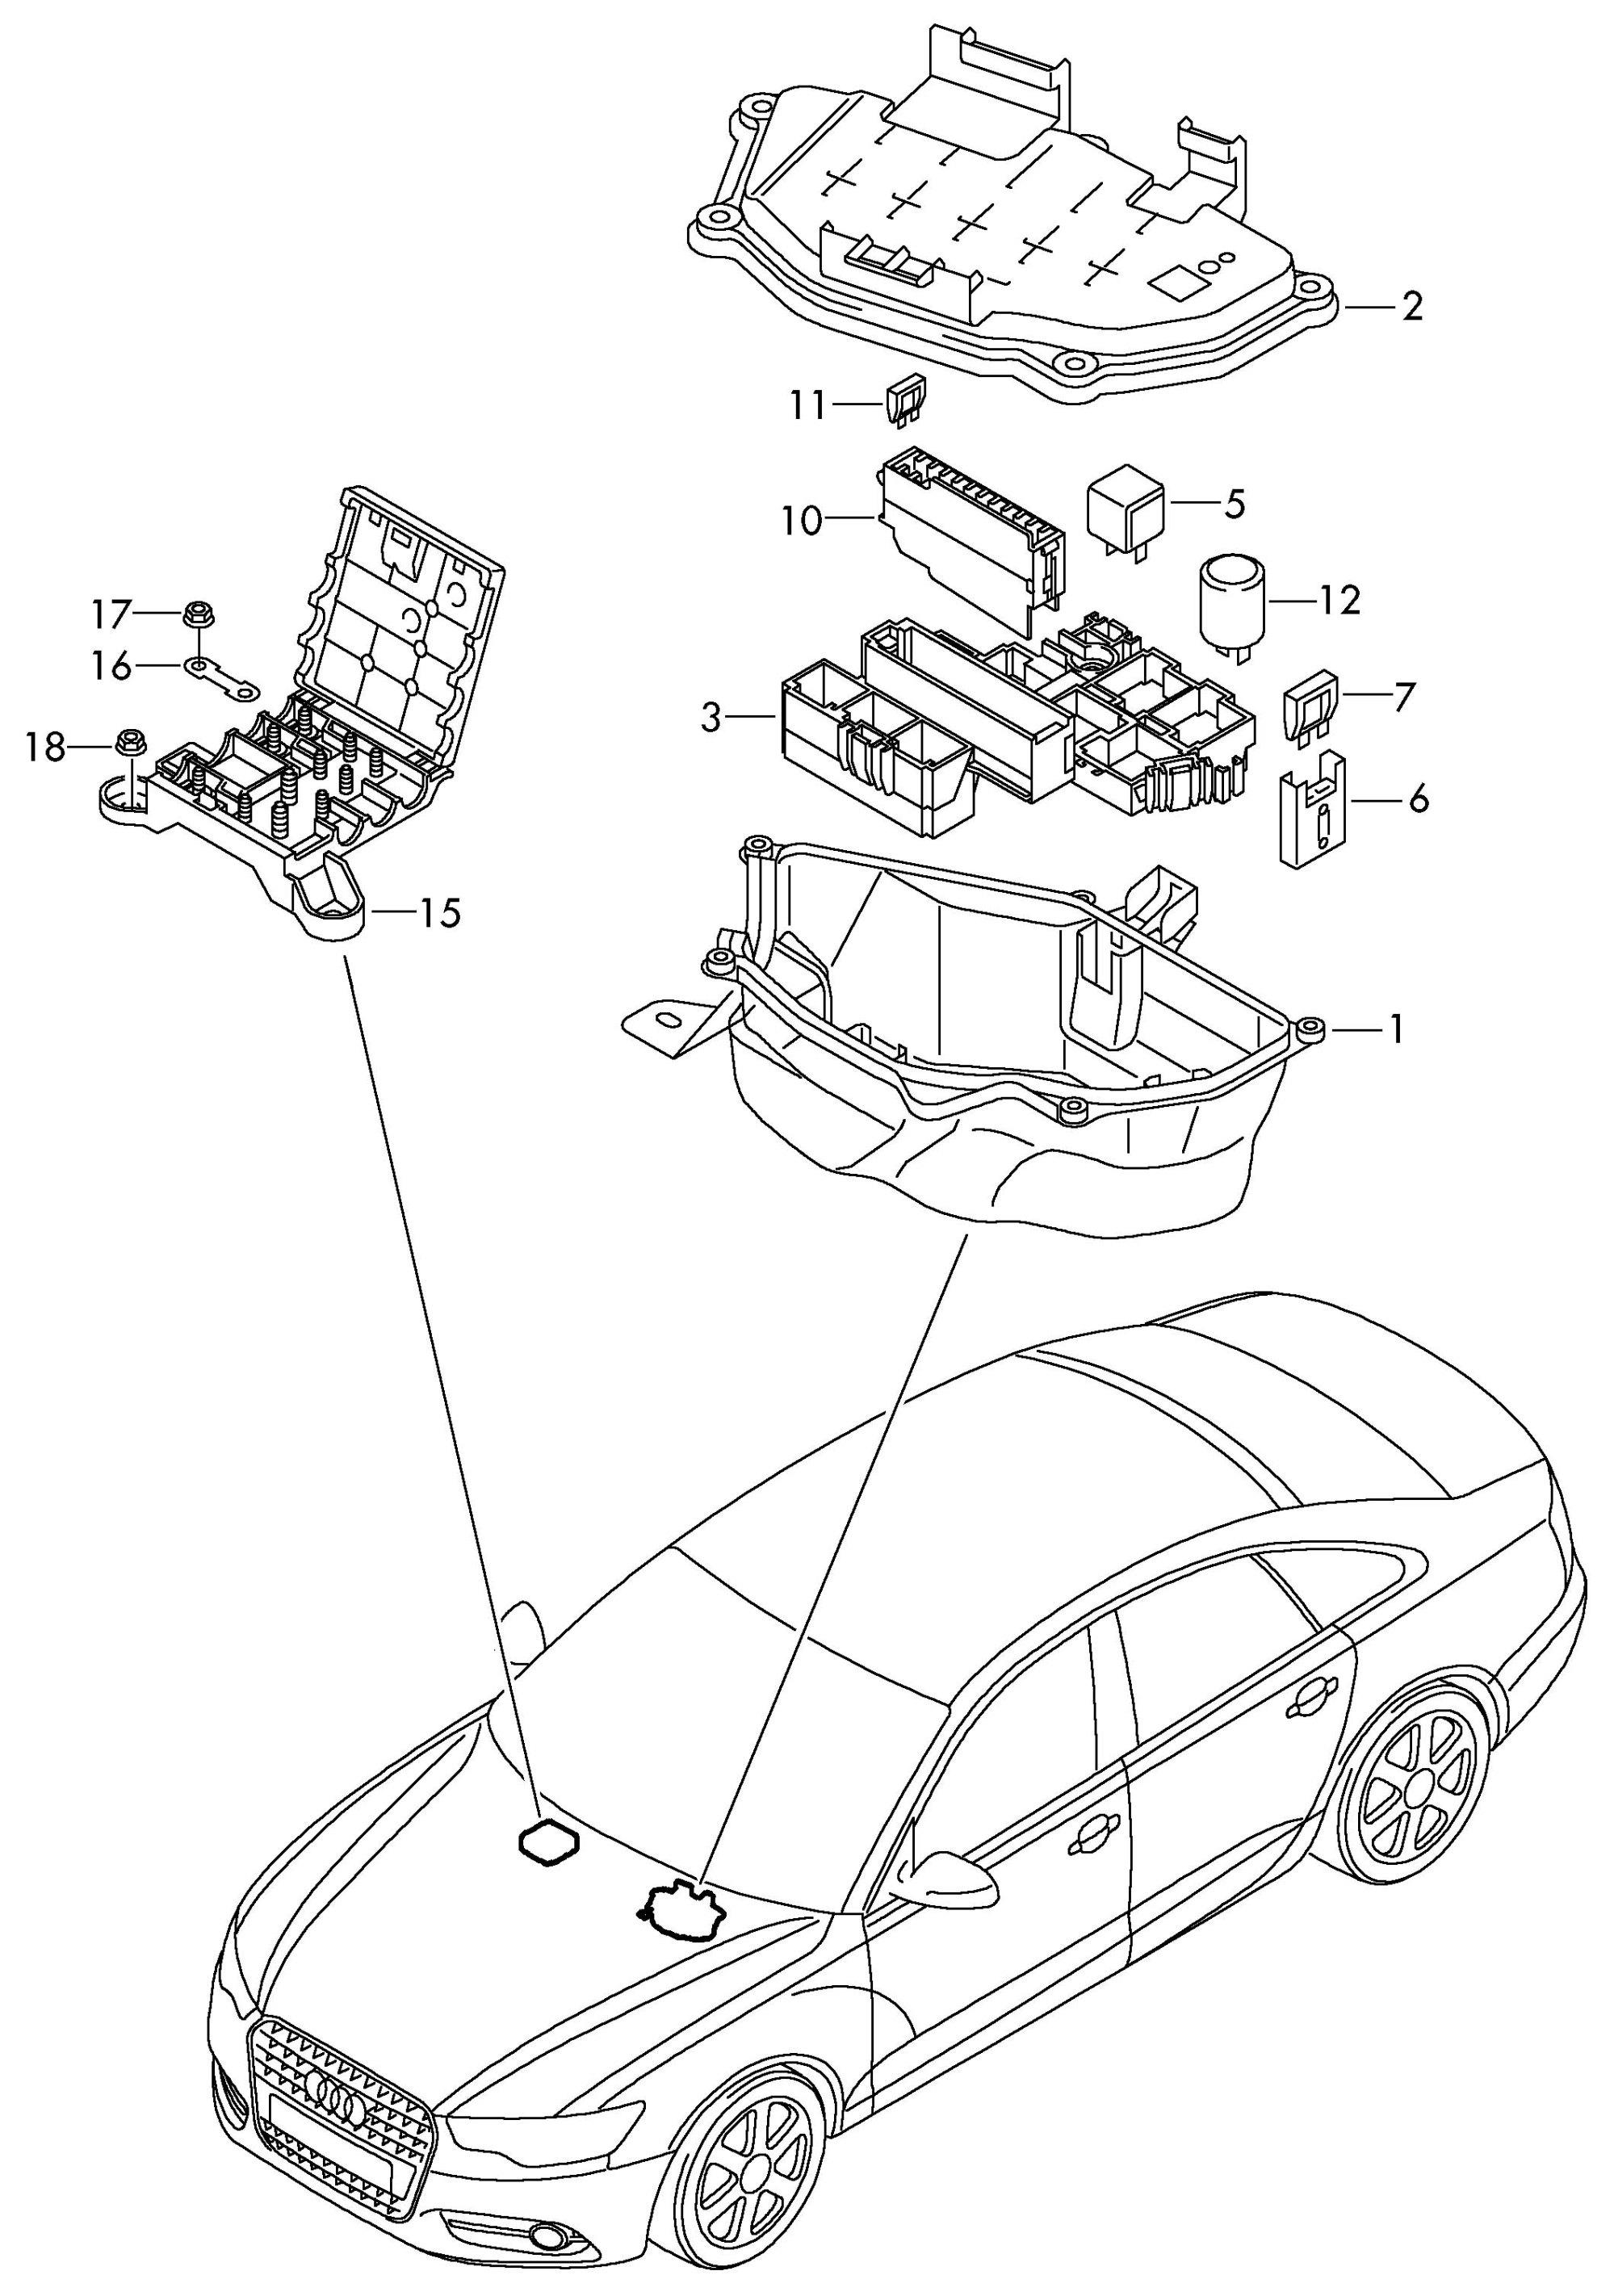 hight resolution of audi r8 fuse box wiring diagrams audi q5 audi r8 fuse box